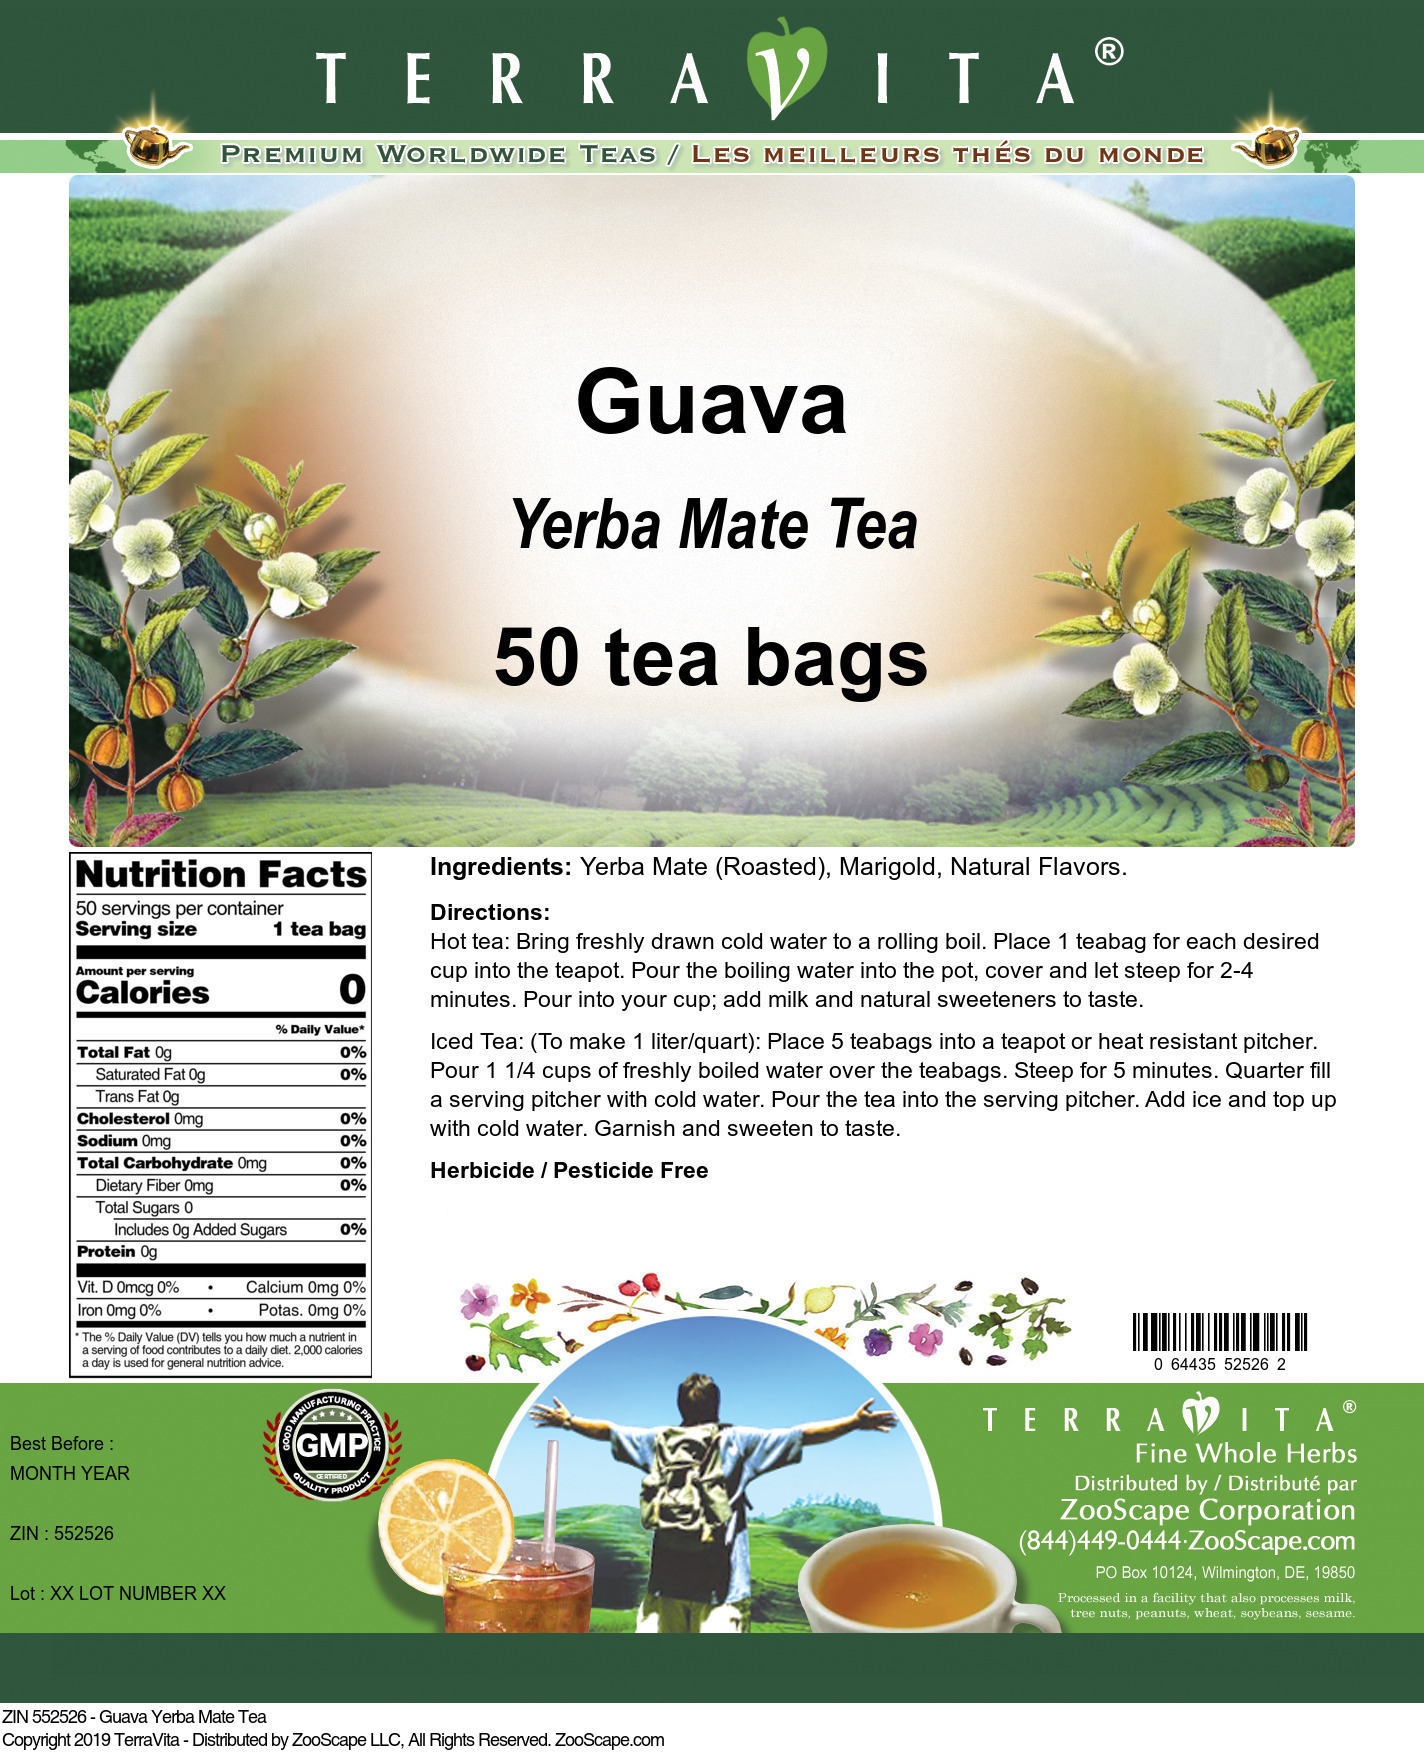 Guava Yerba Mate Tea